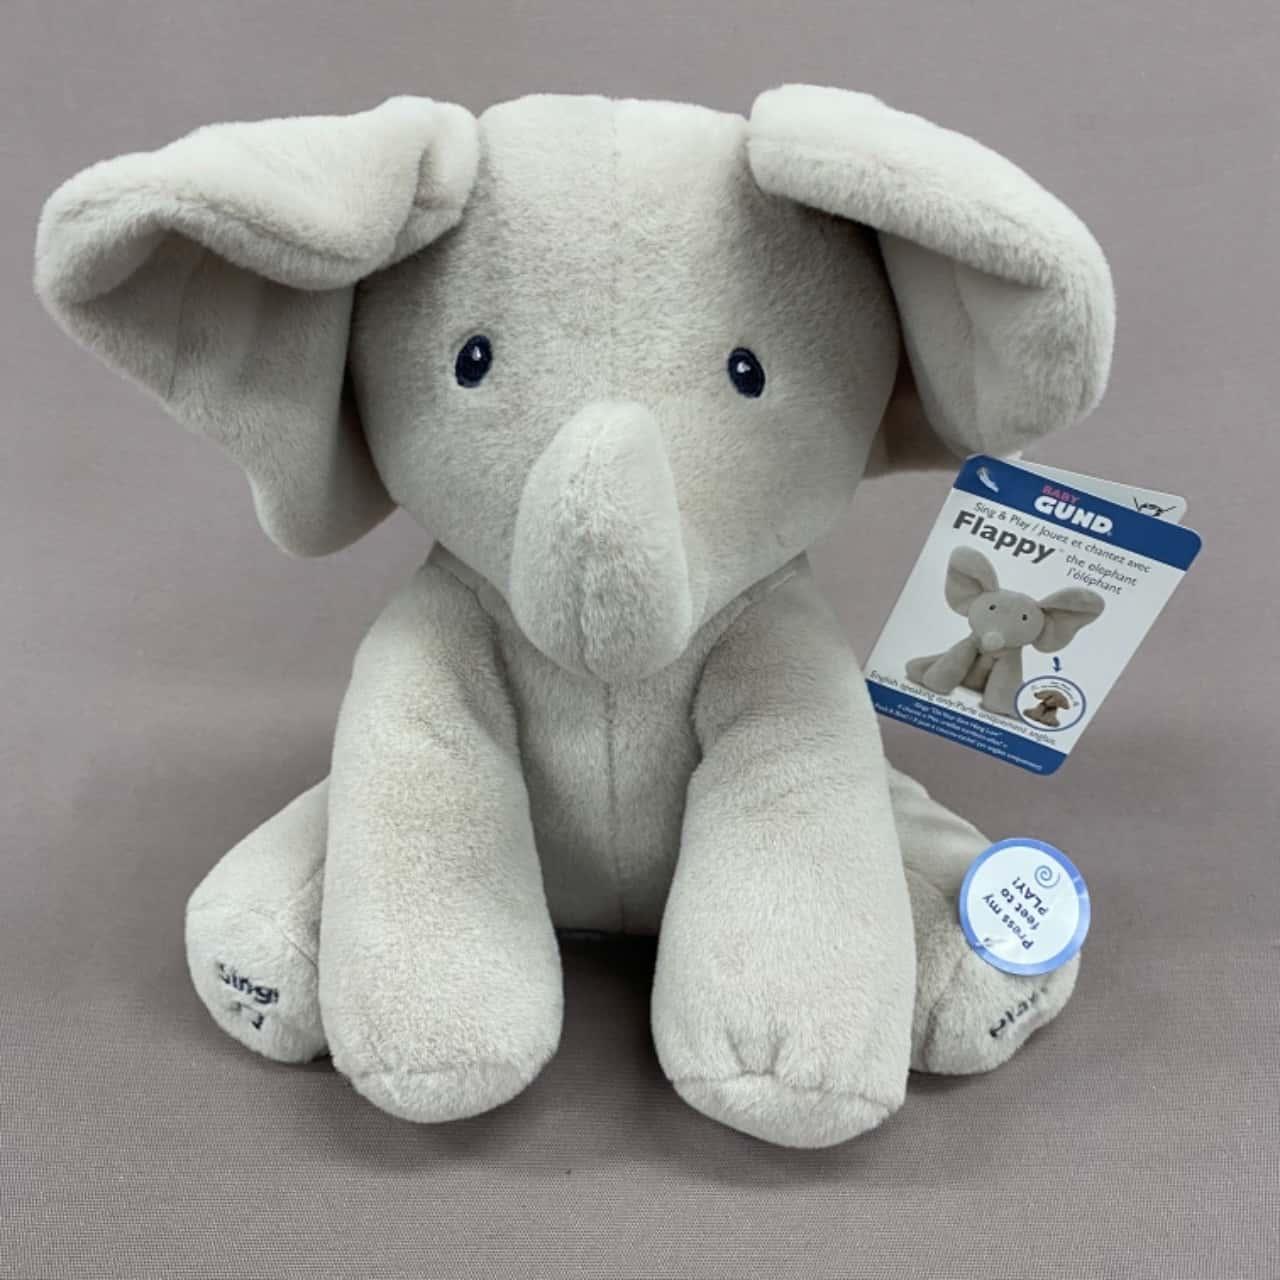 Baby Gund Flappy Singing Elephant